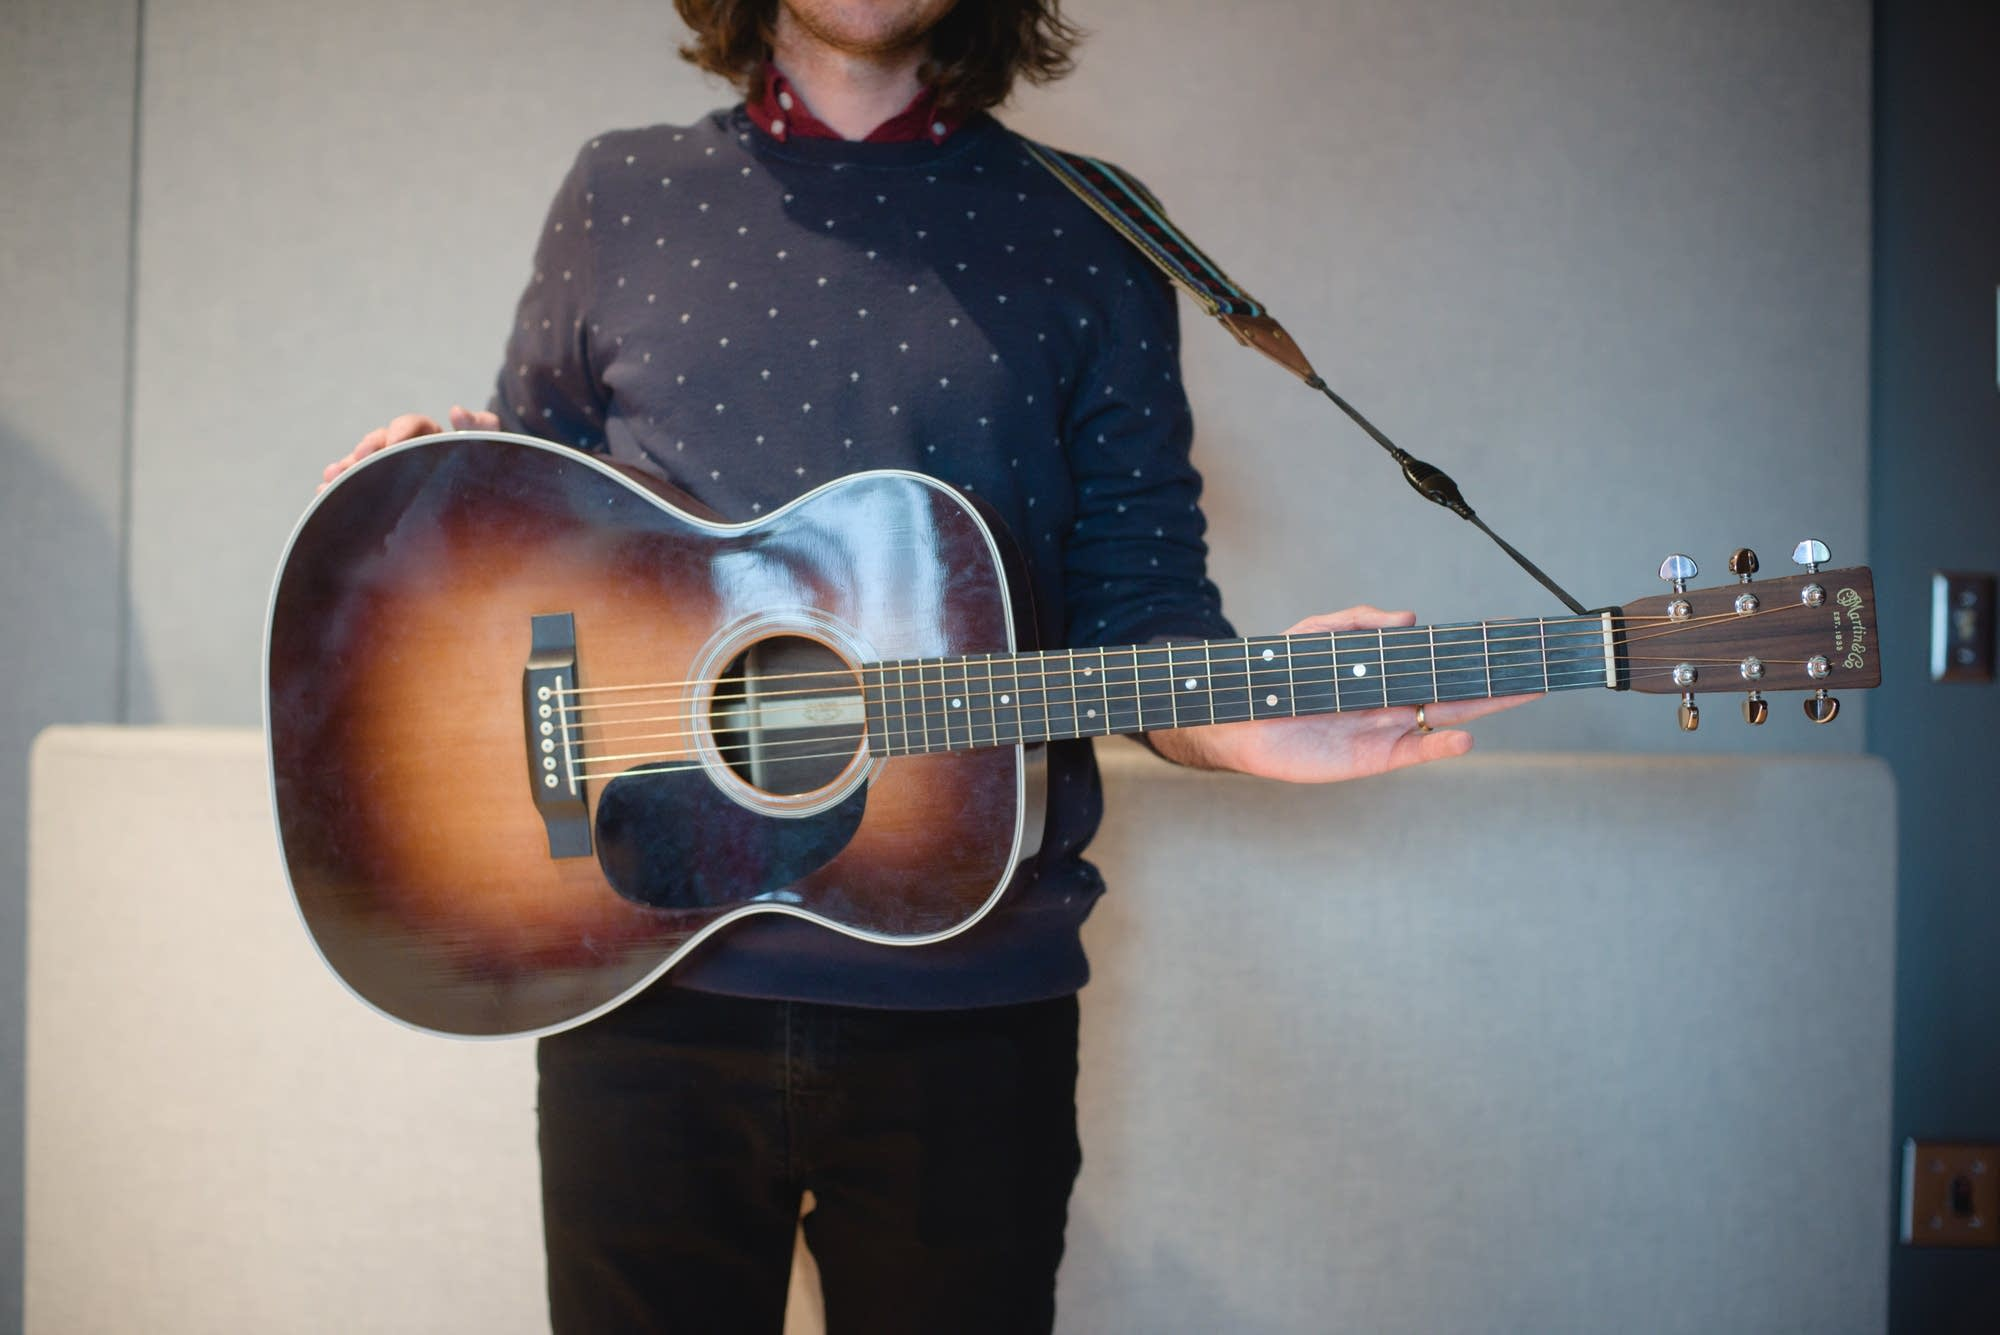 Martin Courtney, Martin OOO-28 acoustic guitar 2